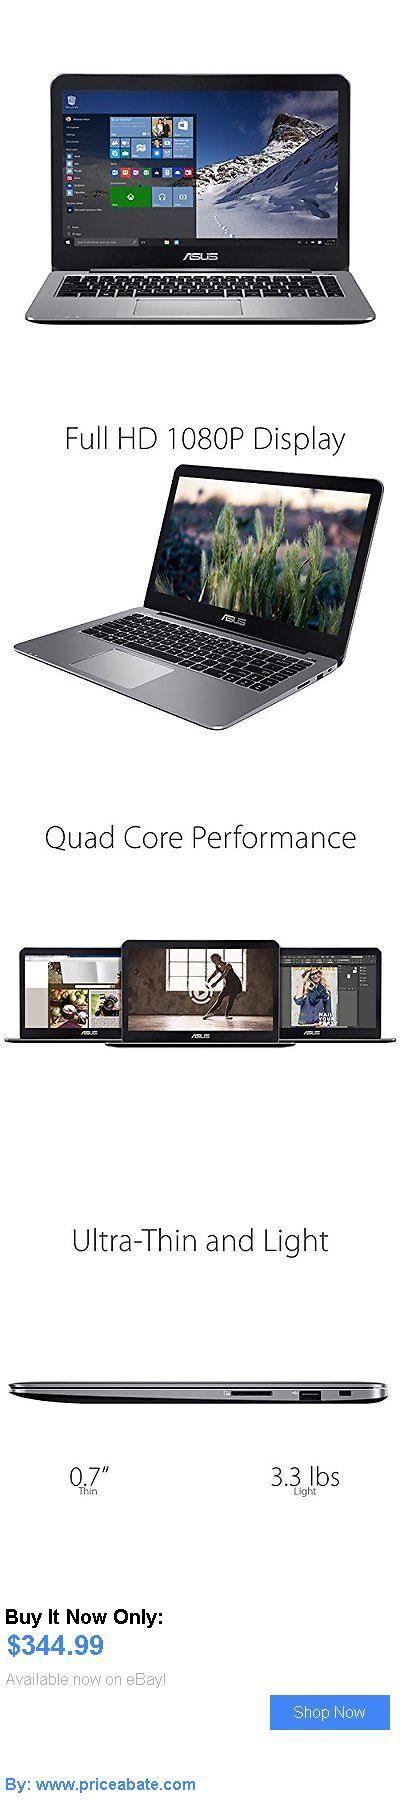 general for sale: Asus Vivobook E403sa-Us21 14-Inch Full Hd Laptop Windows 10 120Gb, Metallic Gray BUY IT NOW ONLY: $344.99 #priceabategeneralforsale OR #priceabate